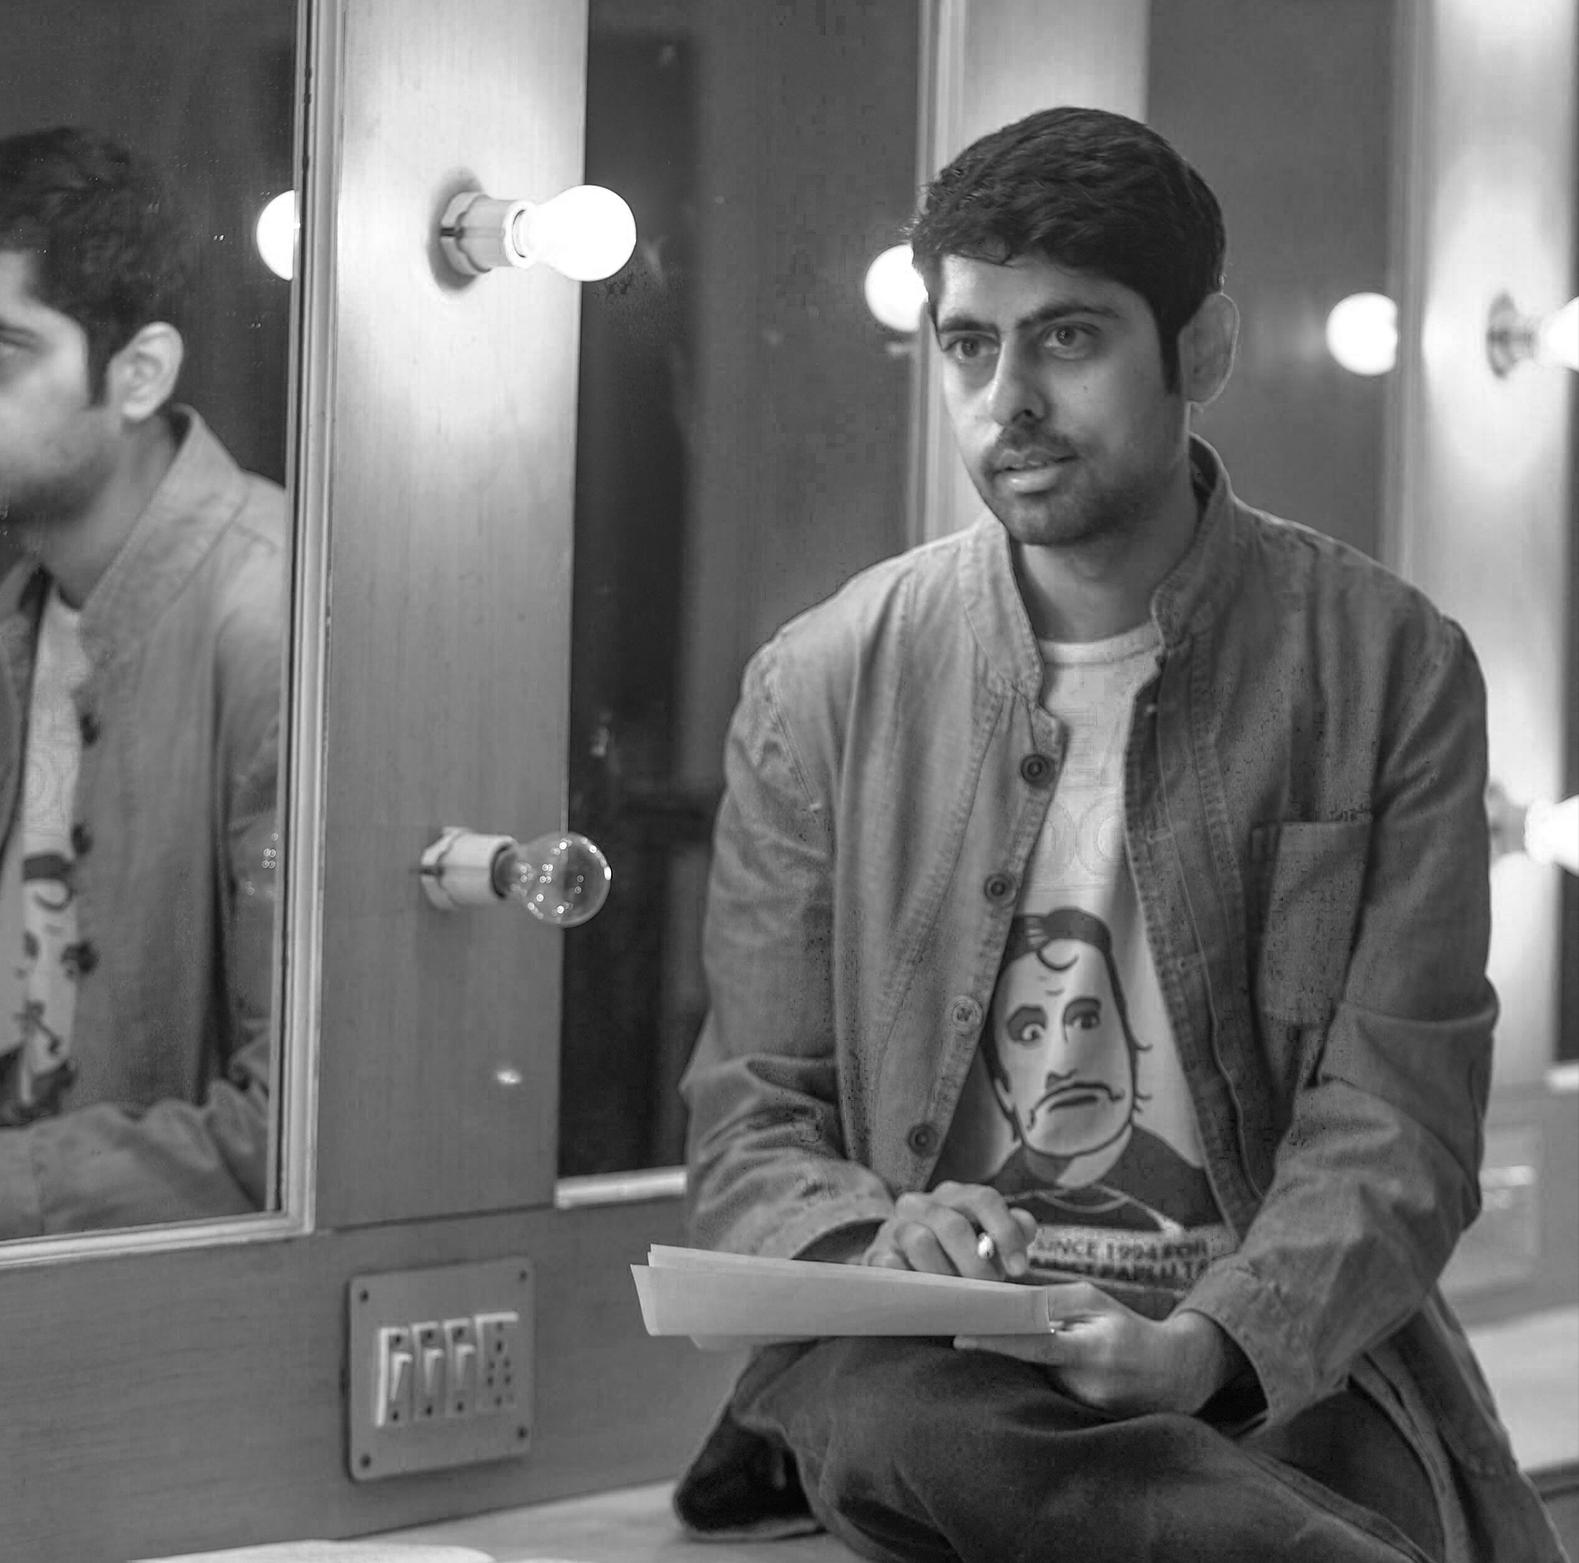 Varun Grover - Screen-Writer,National Award winning lyricist based in Mumbai, All about music virtual edition 2020 speaker